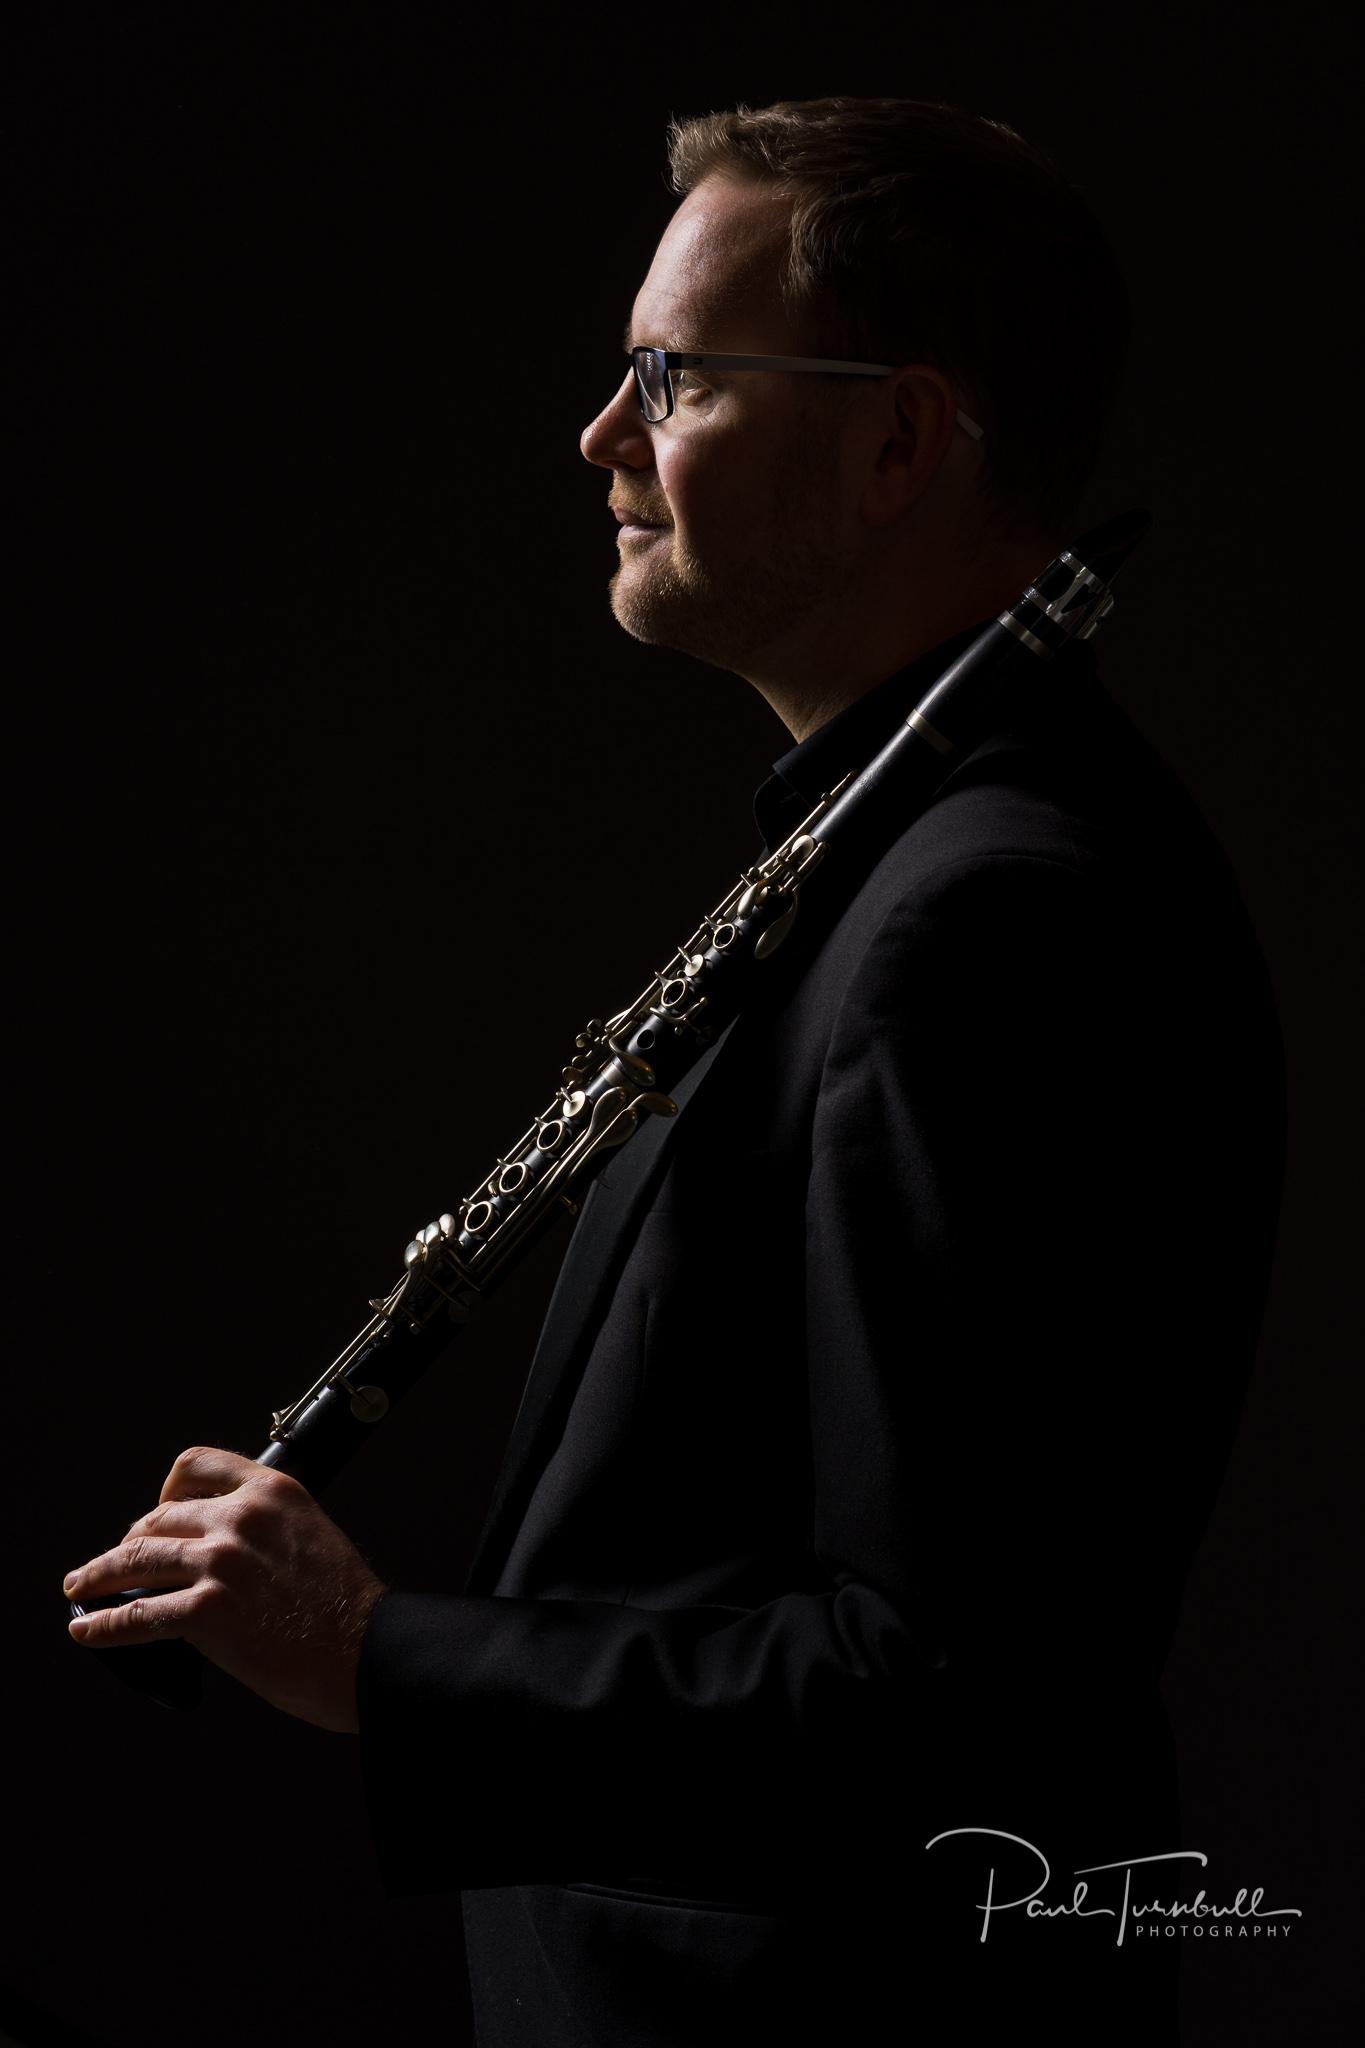 musician-headshot-portrait photographer-leeds-yorkshire-004.jpg